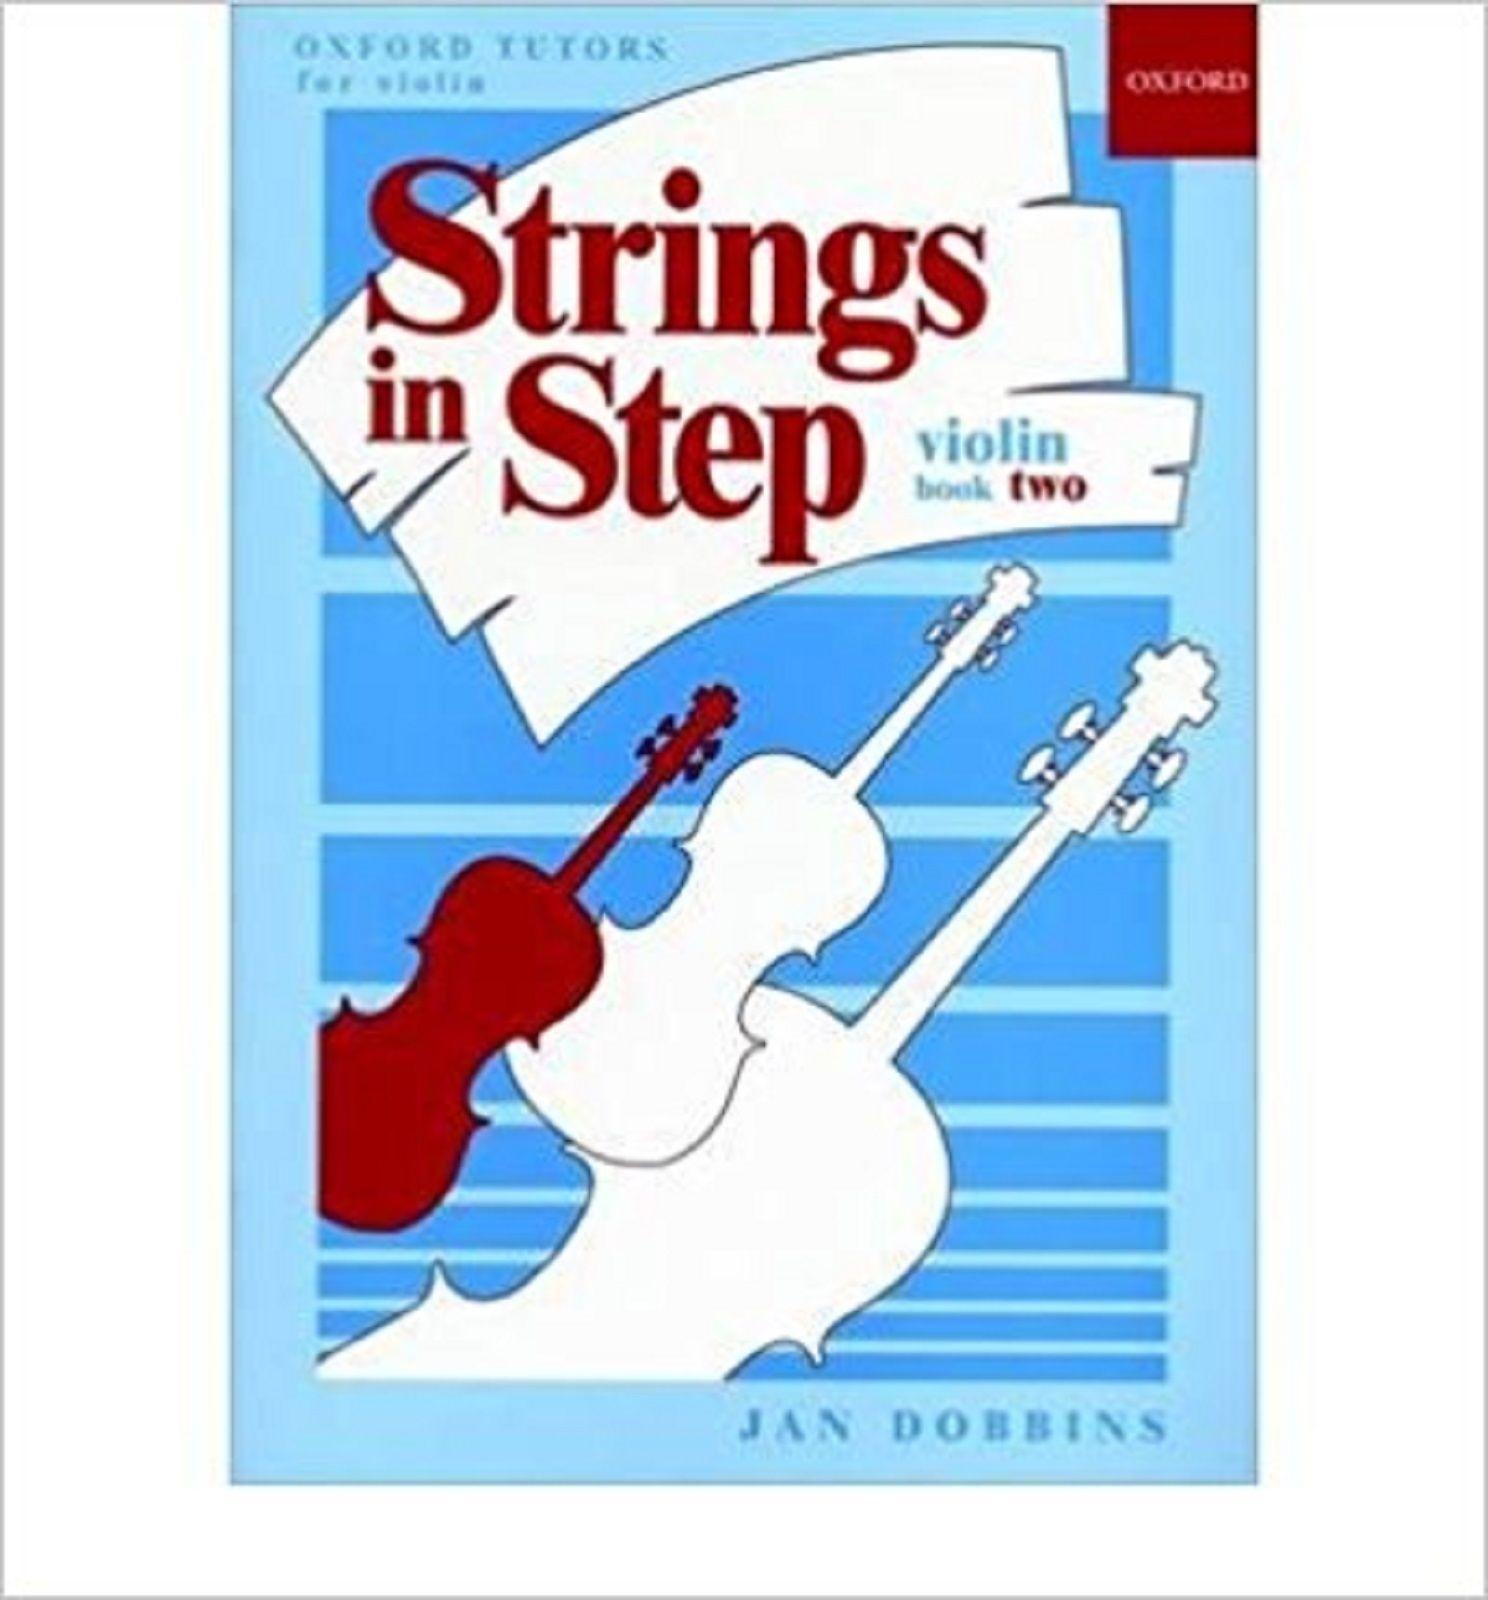 Strings In Step Violin Book 2 Learn How to Play Method by Jan Dobbbins S139